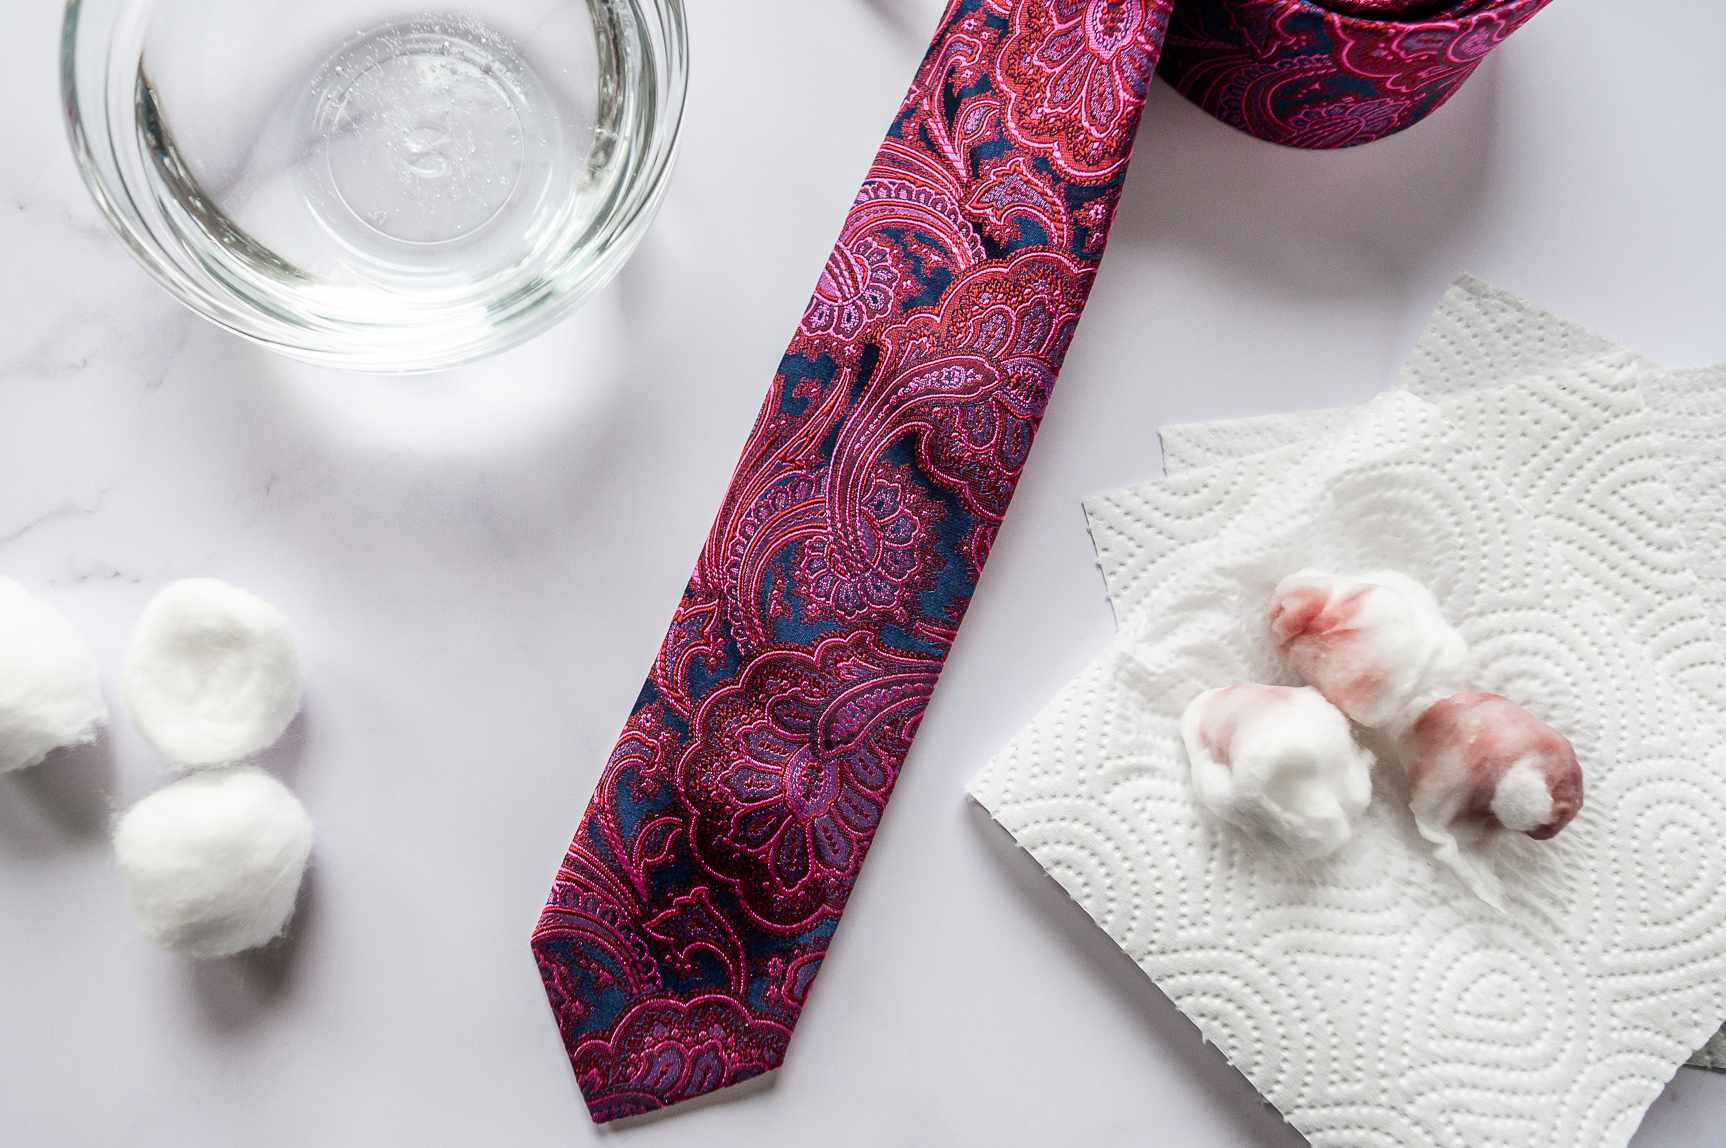 A tie next to cotton balls, napkins, and club soda